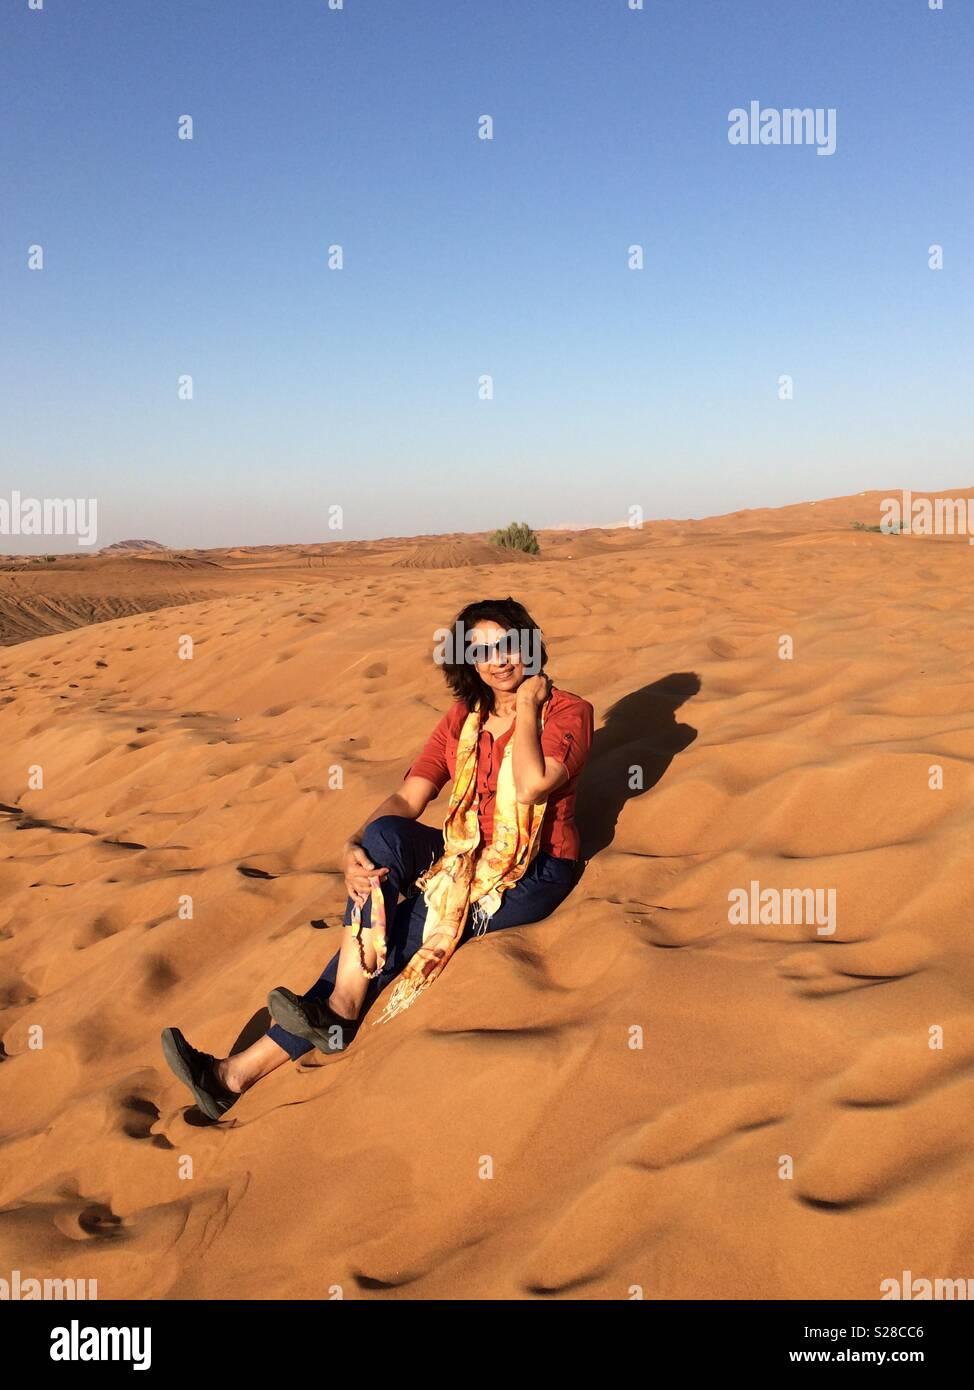 Sea of Sand - Stock Image